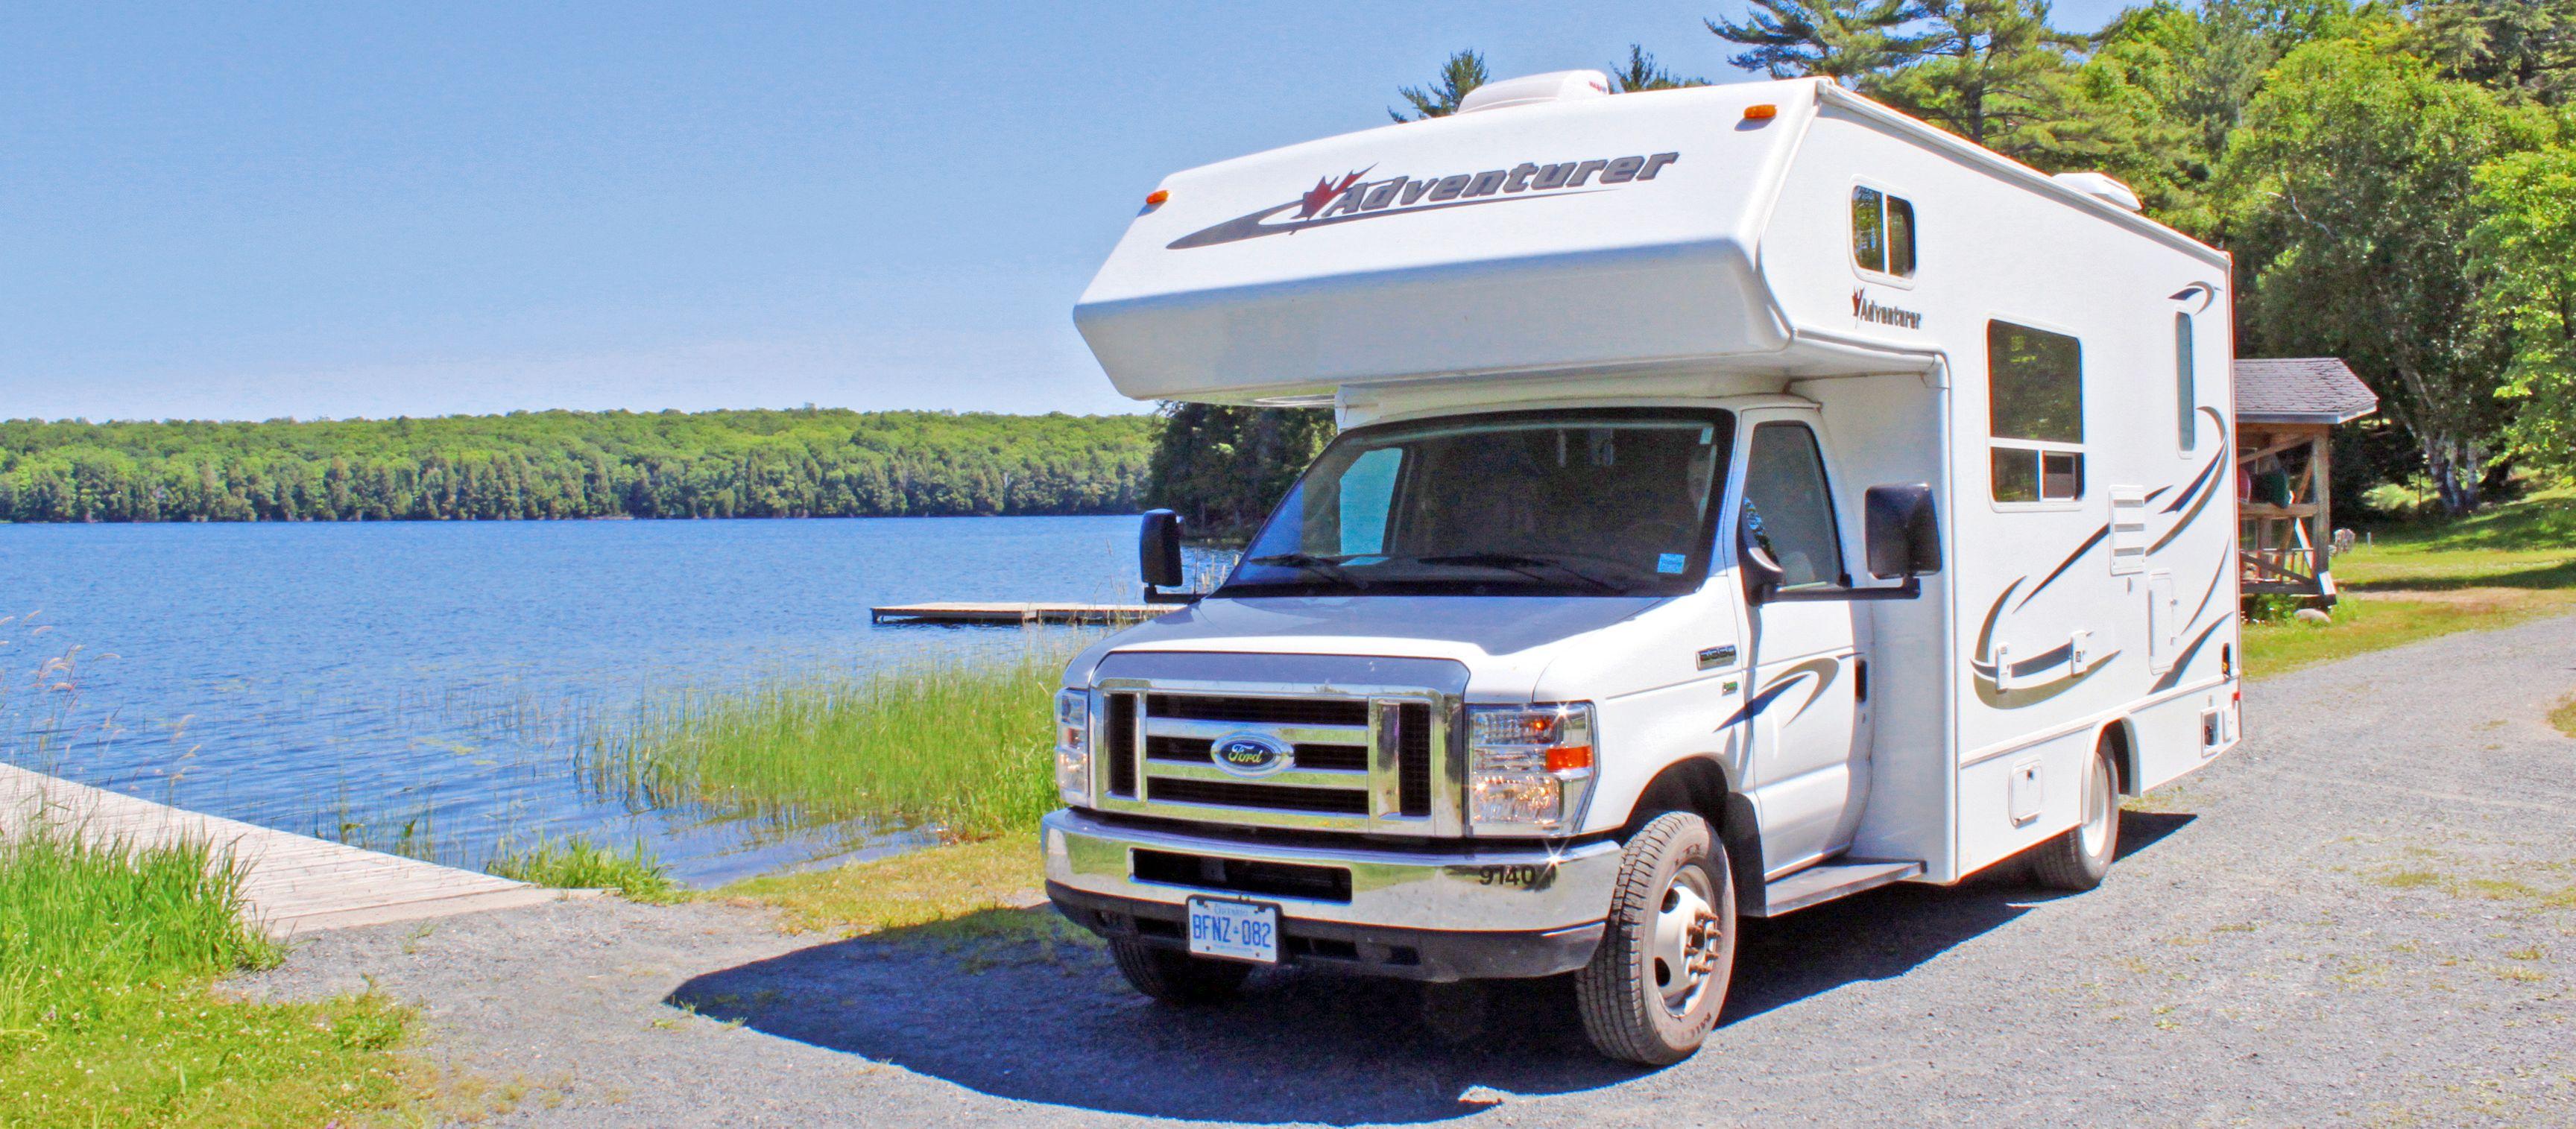 Brownlee Lake Campground